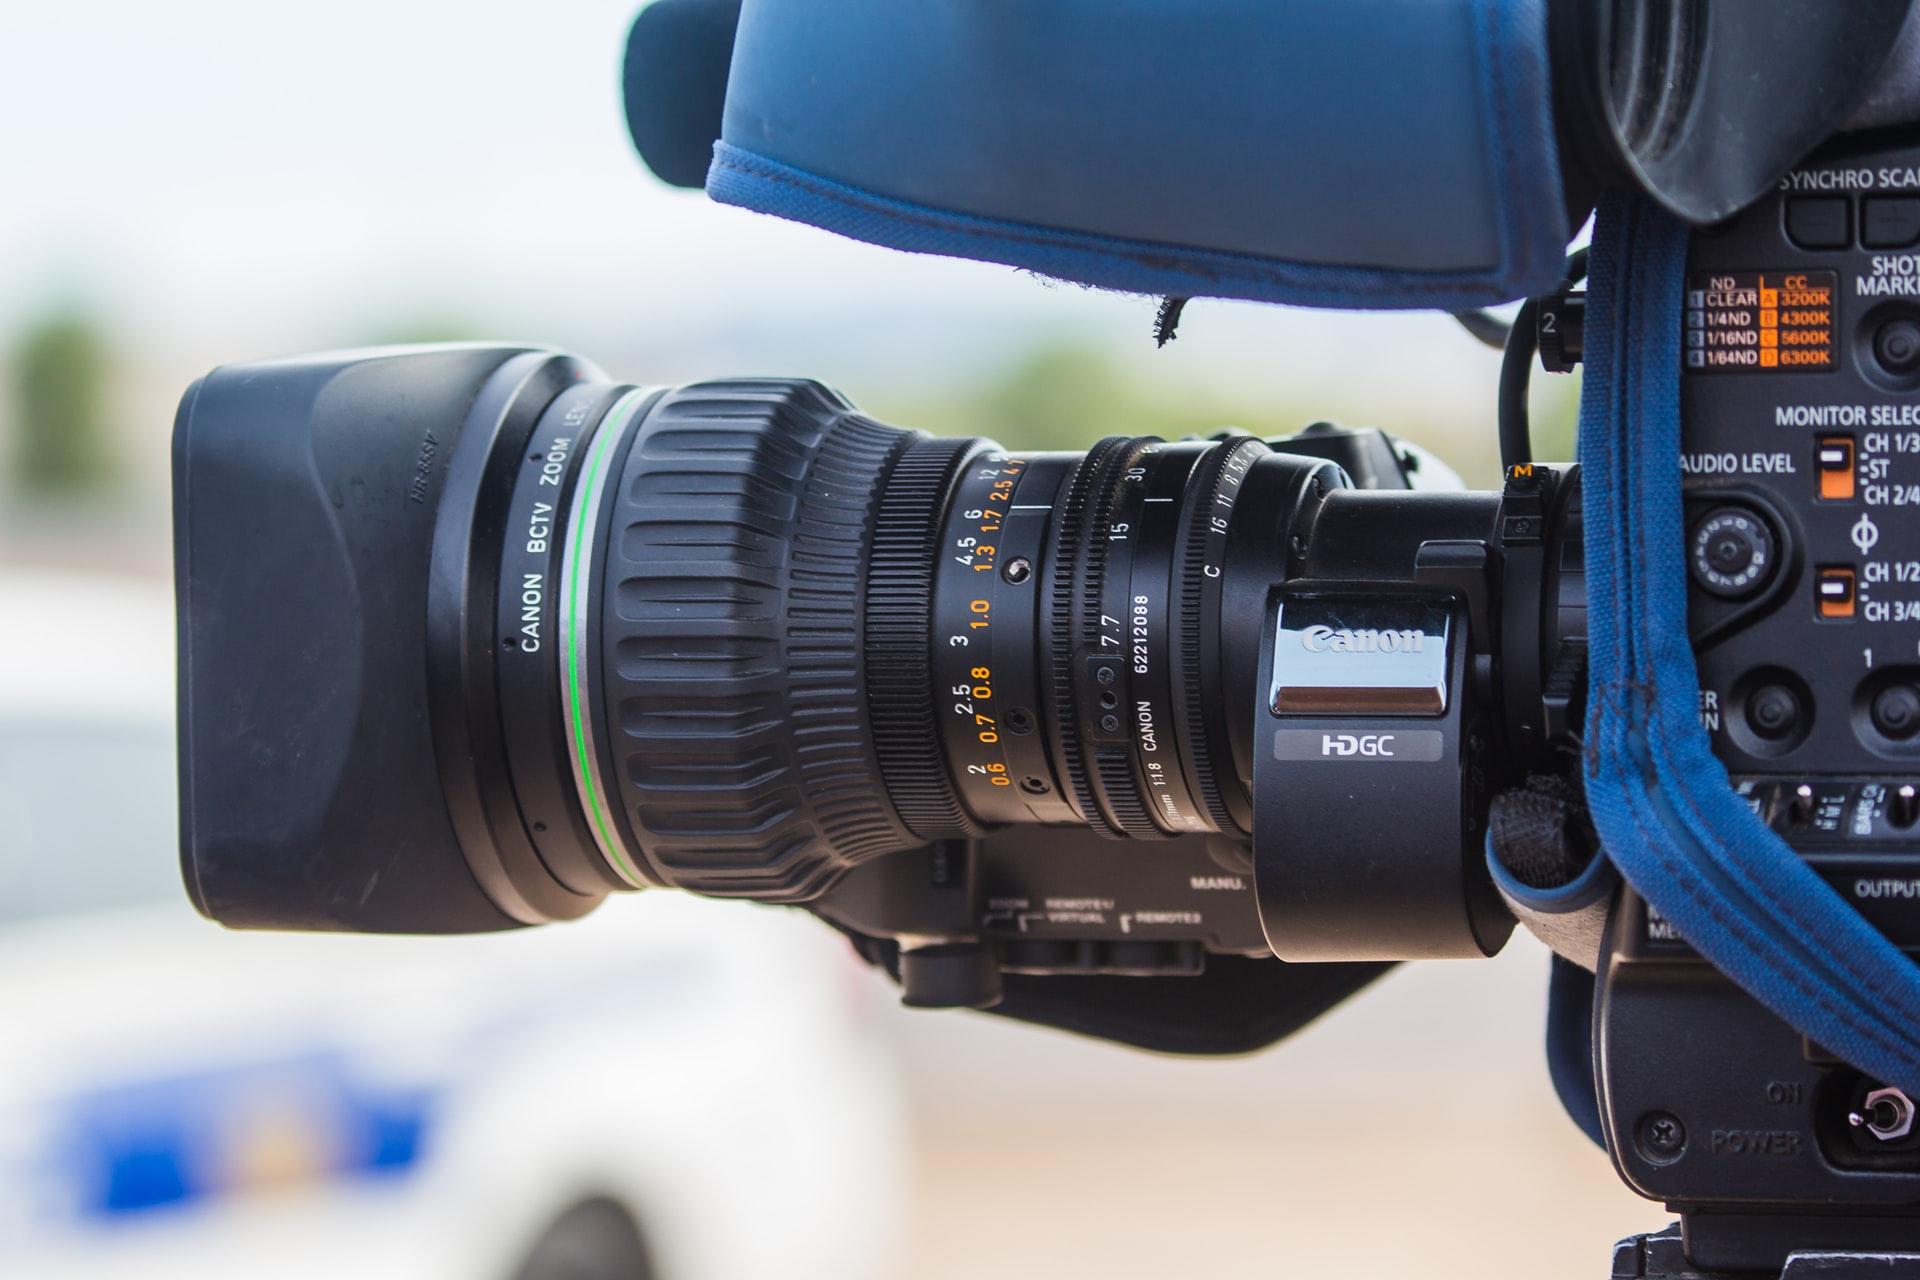 Media ministry utilizes film and drama to spread the Gospel